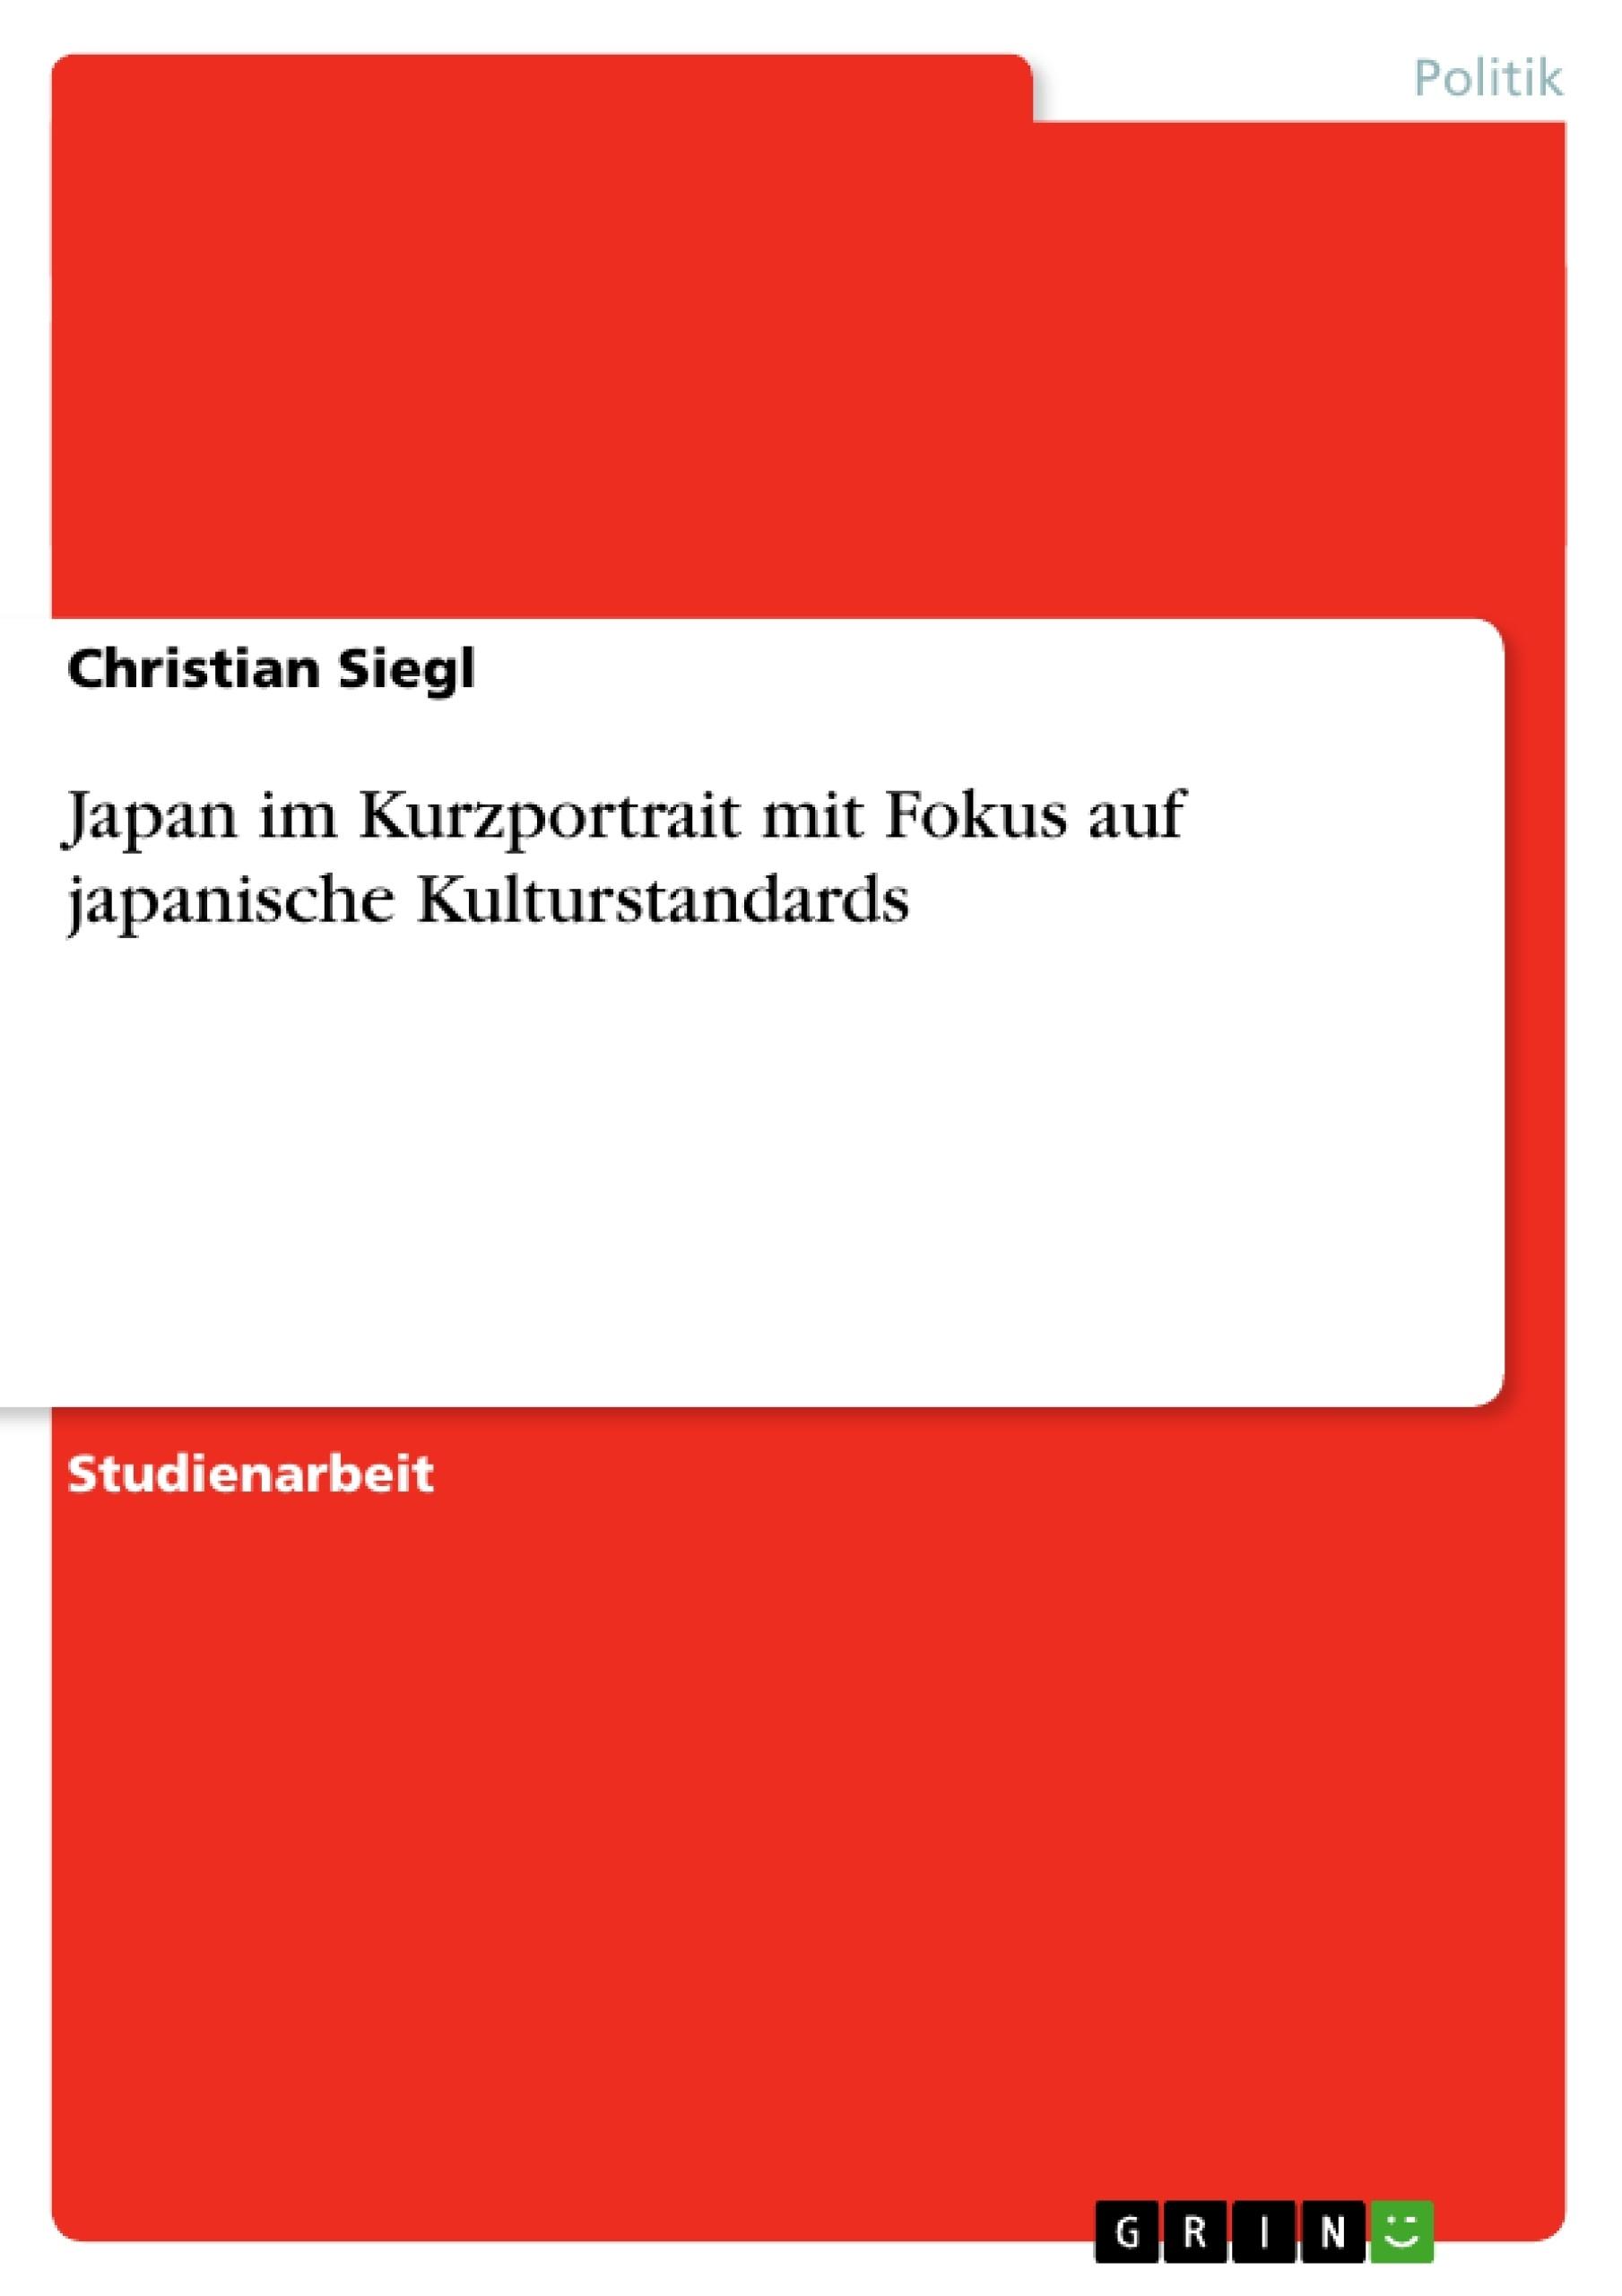 Titel: Japan im Kurzportrait mit Fokus auf japanische Kulturstandards